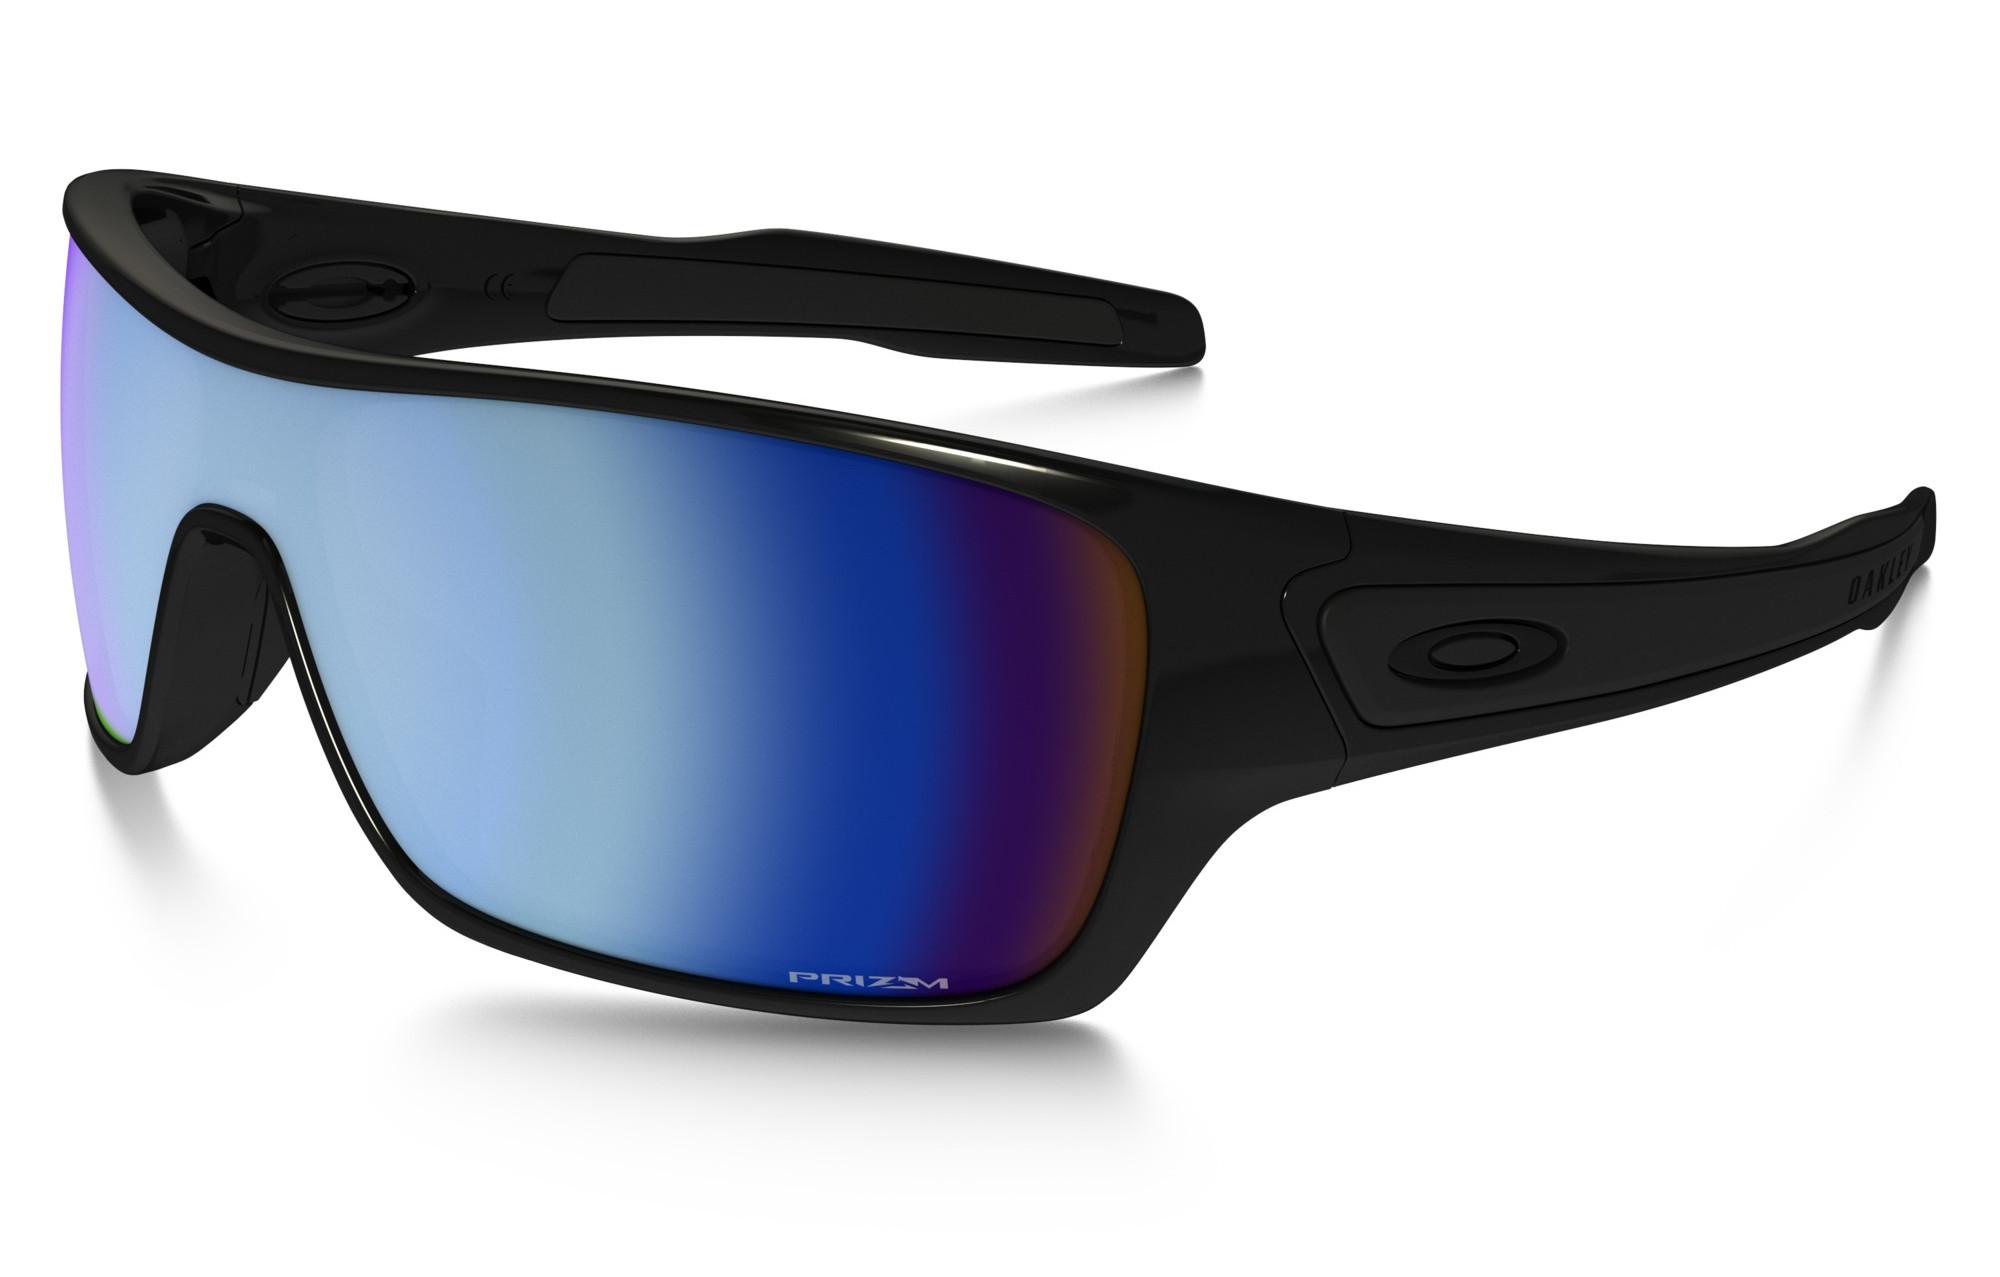 81e177c66f OAKLEY Sunglasses TURBINE ROTOR Black - Blue Prizm Deep Water Polarized  OO9307-08